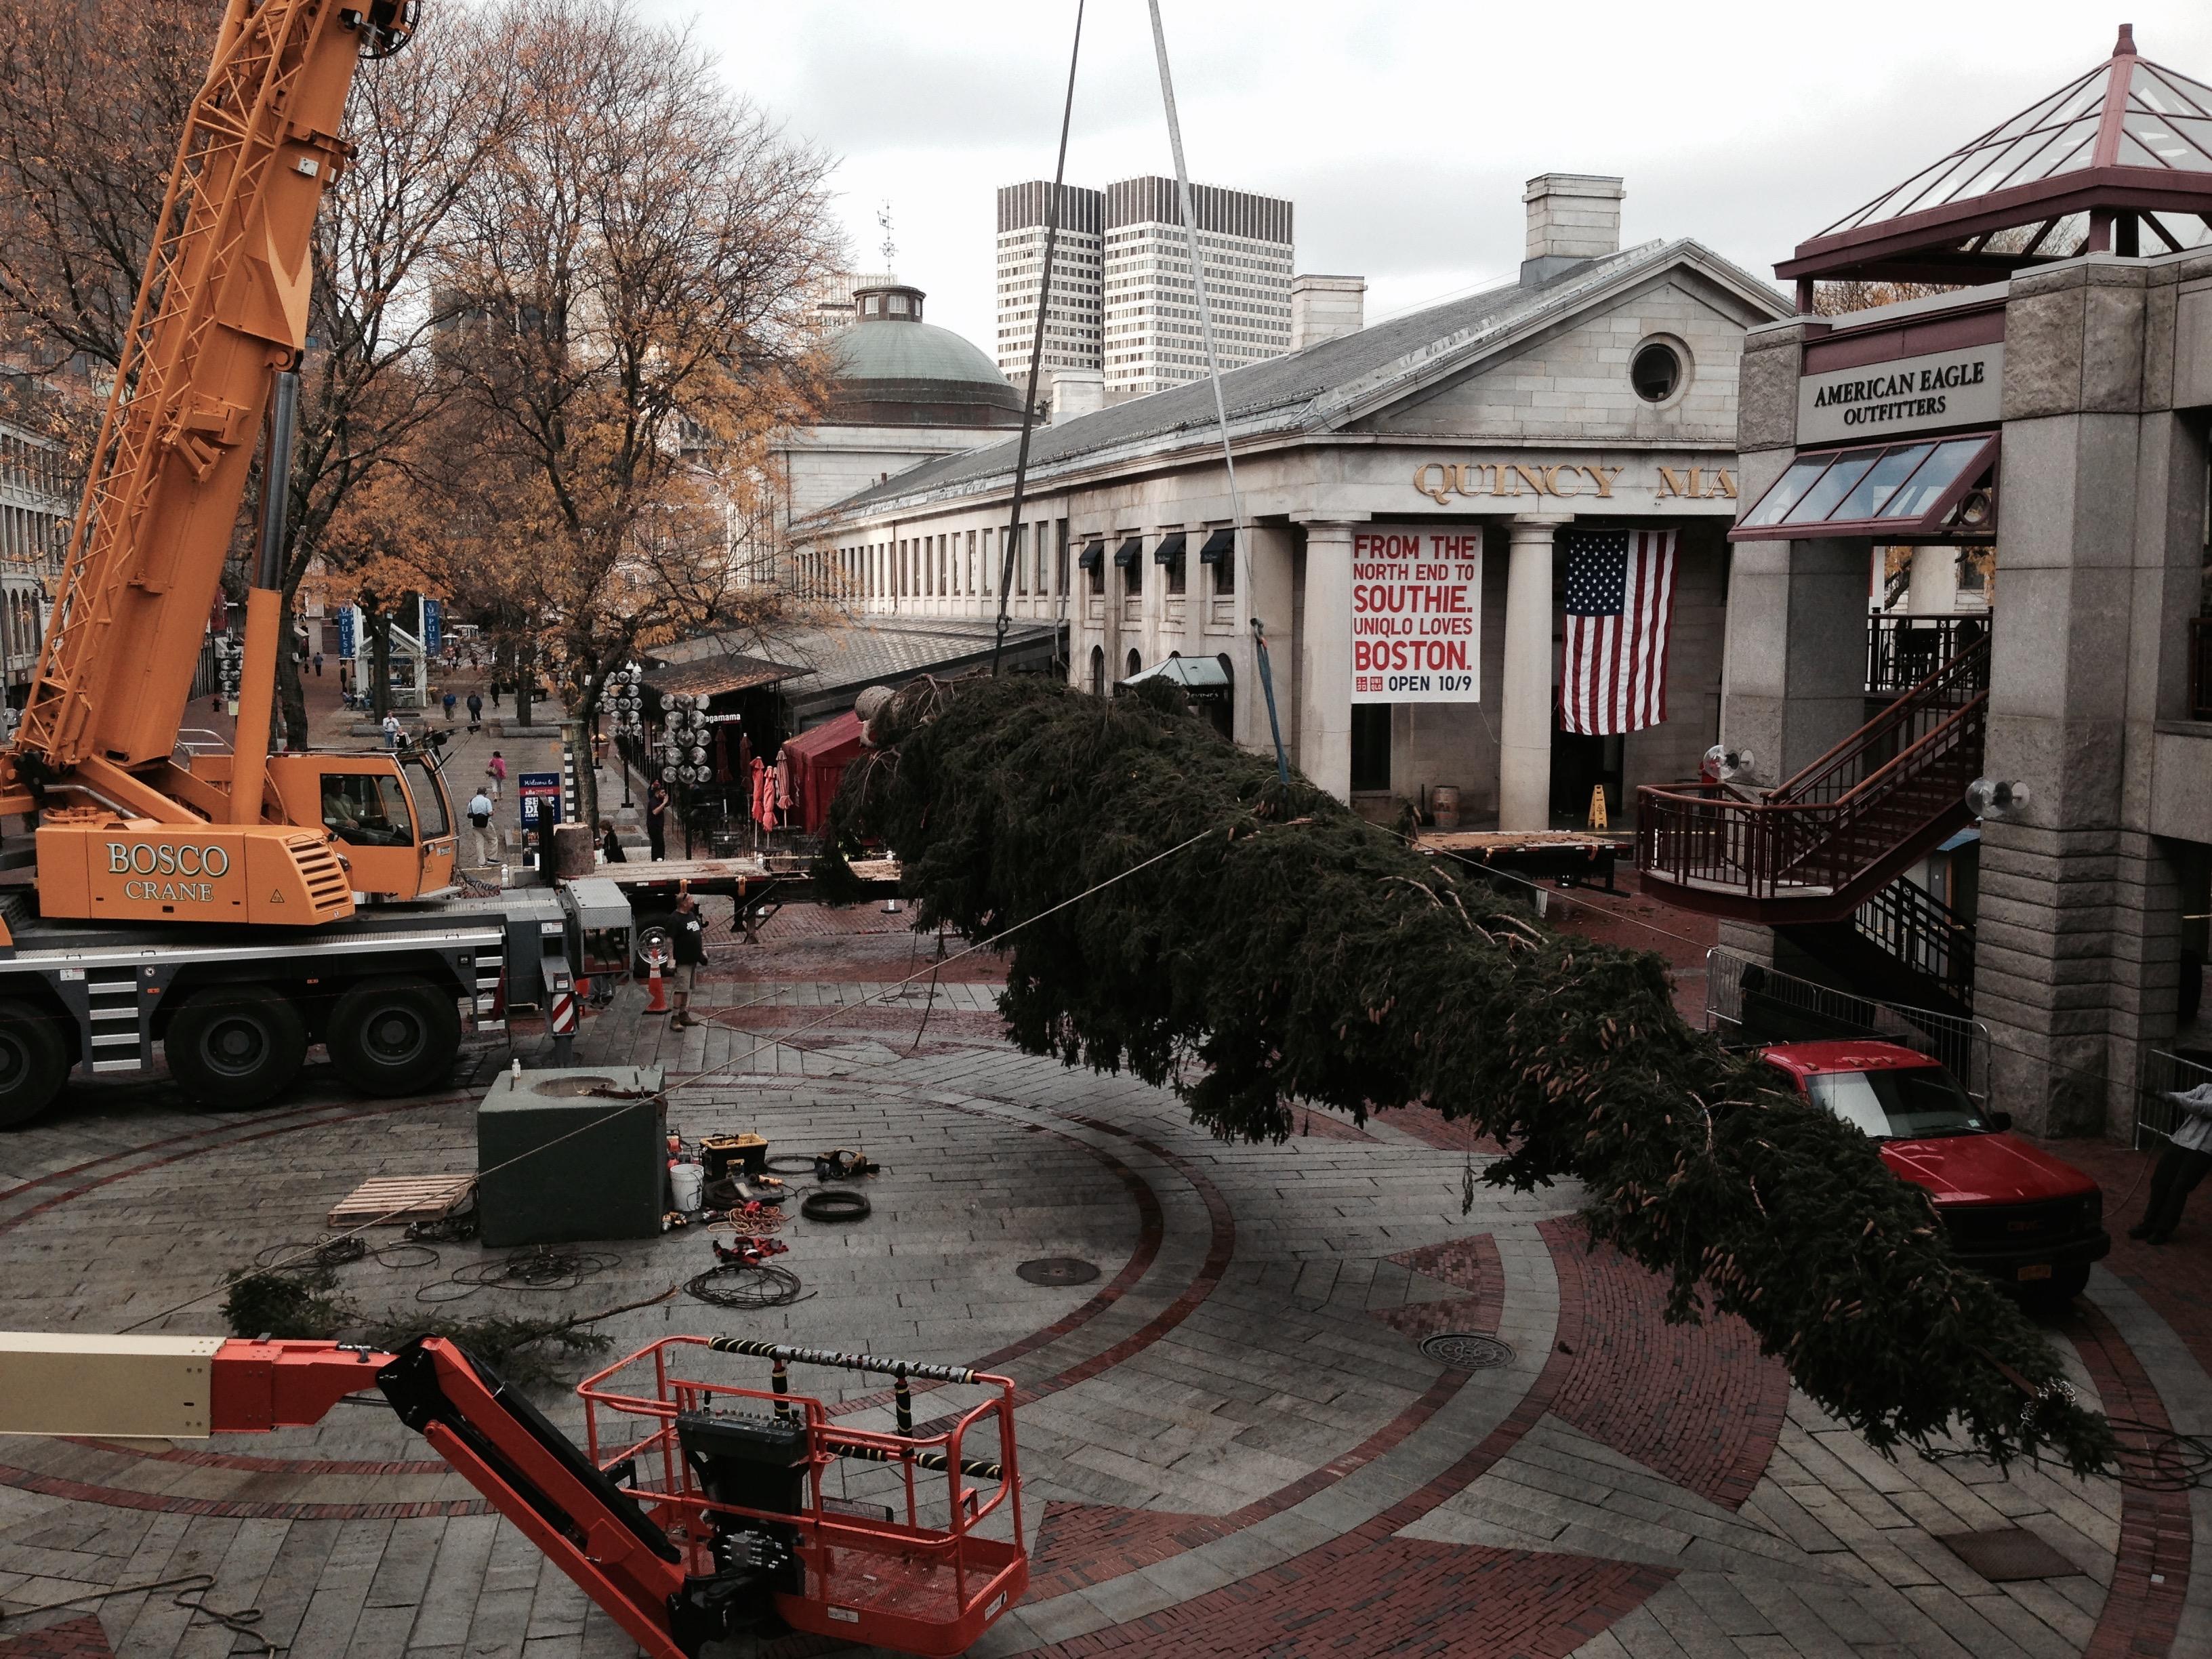 Boston-erecting tied tree